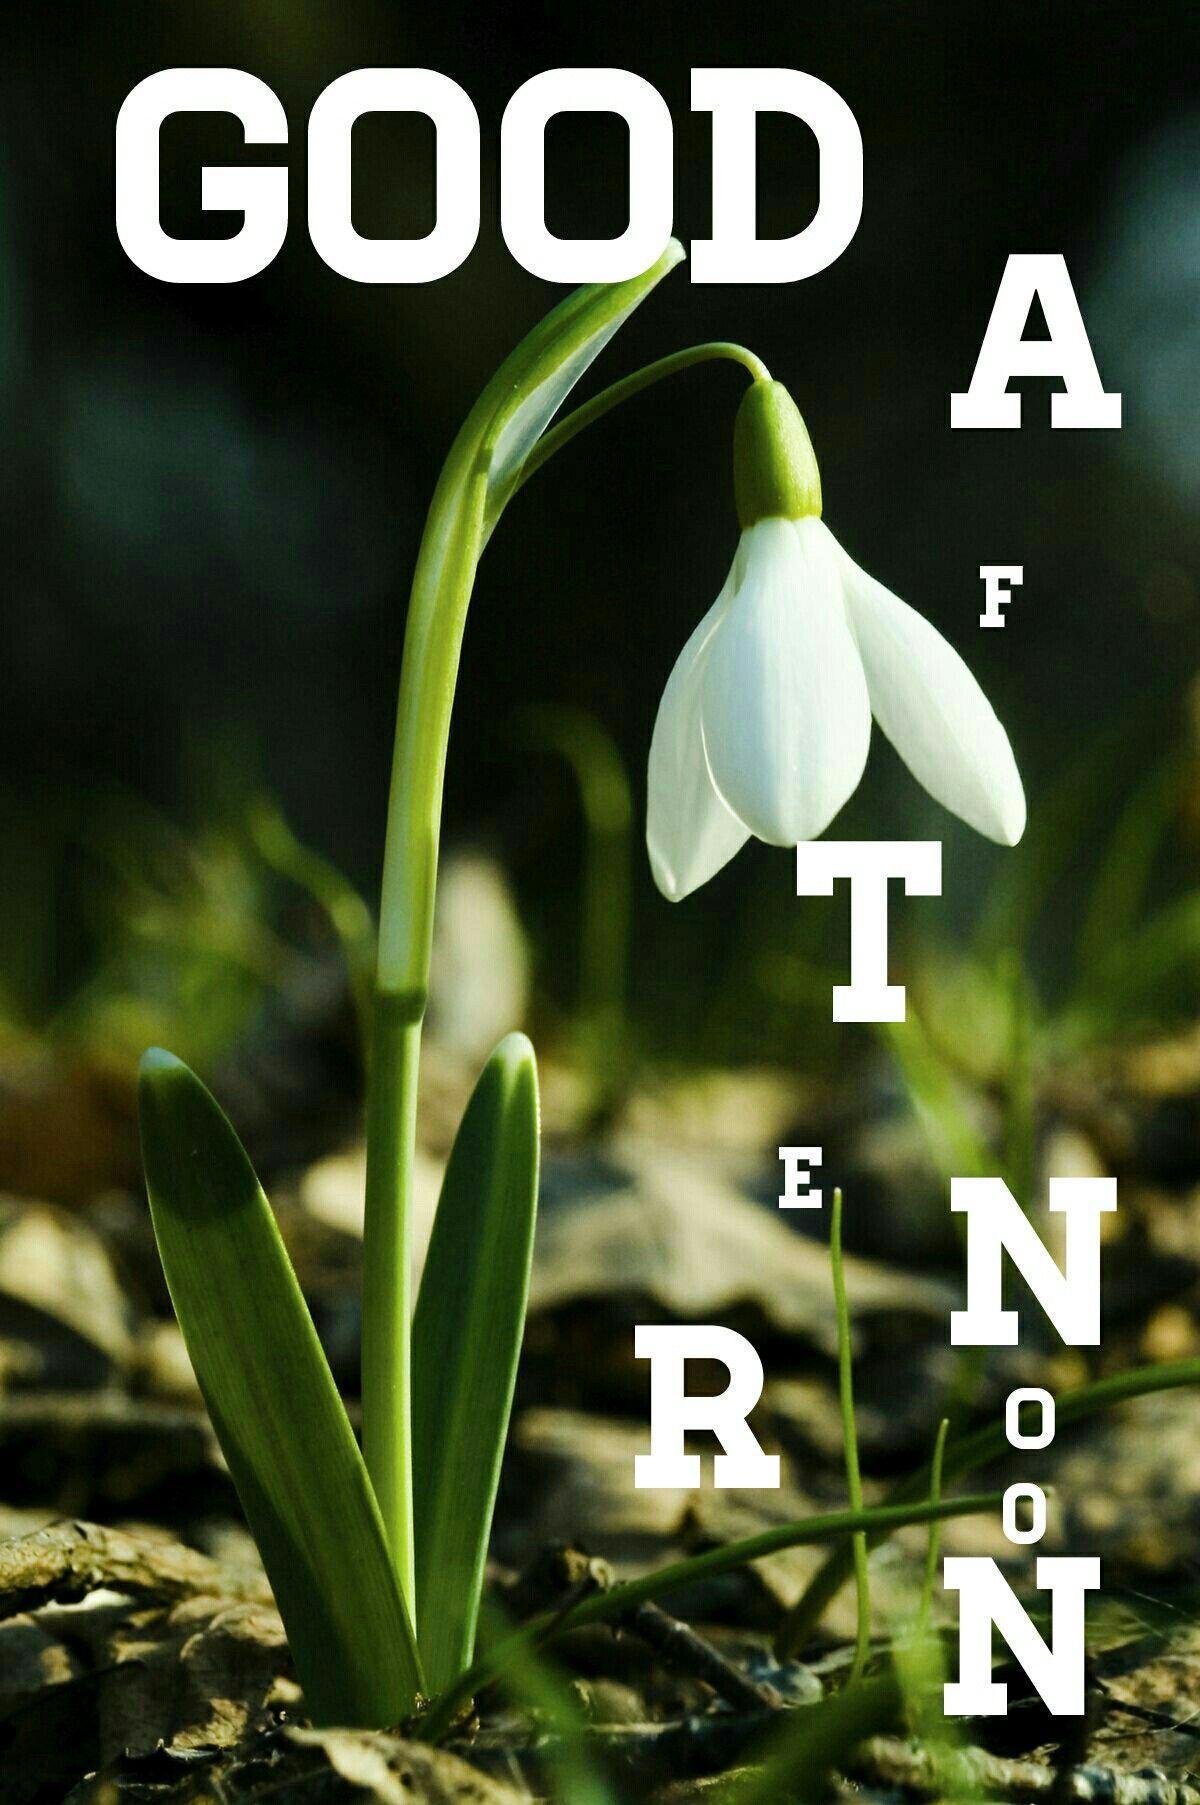 Pin By Anita Wandrag On Good Afternoon Good Evening Good Afternoon Quotes Good Afternoon Good Morning Greetings